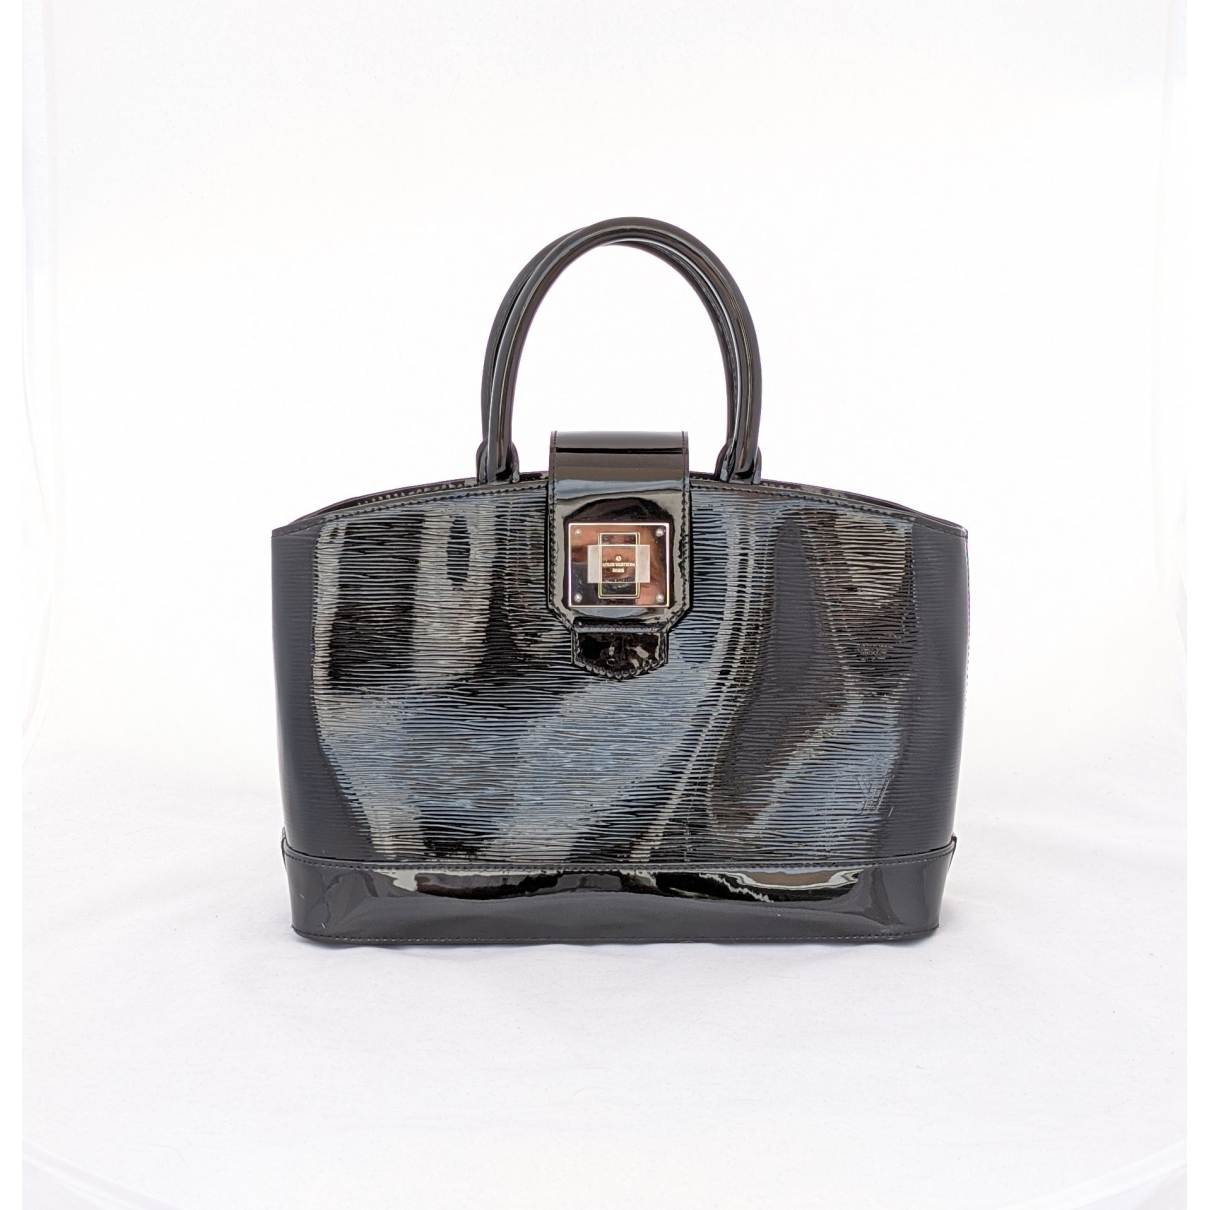 Louis Vuitton \N Black Patent leather handbag for Women \N